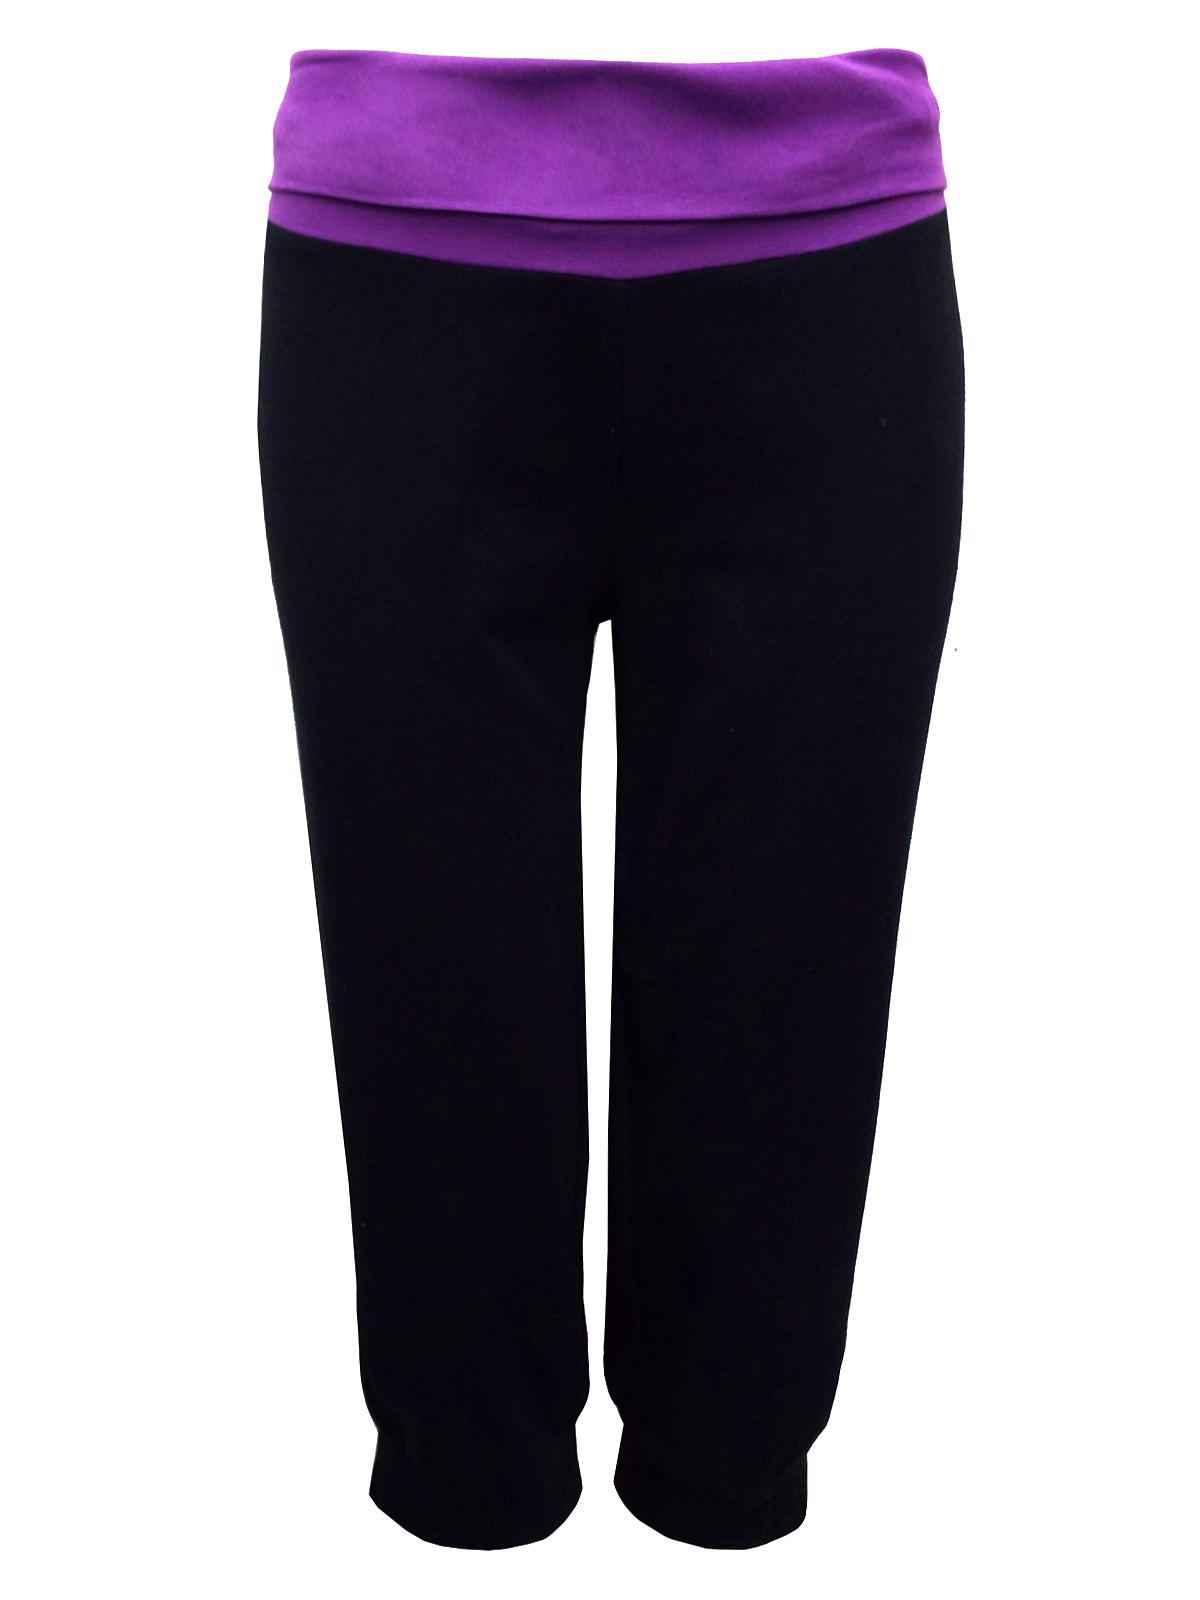 Decathlon Decathlon Black Cotton Rich Contrast Waist Cropped Yoga Bottoms Size 6 To 26